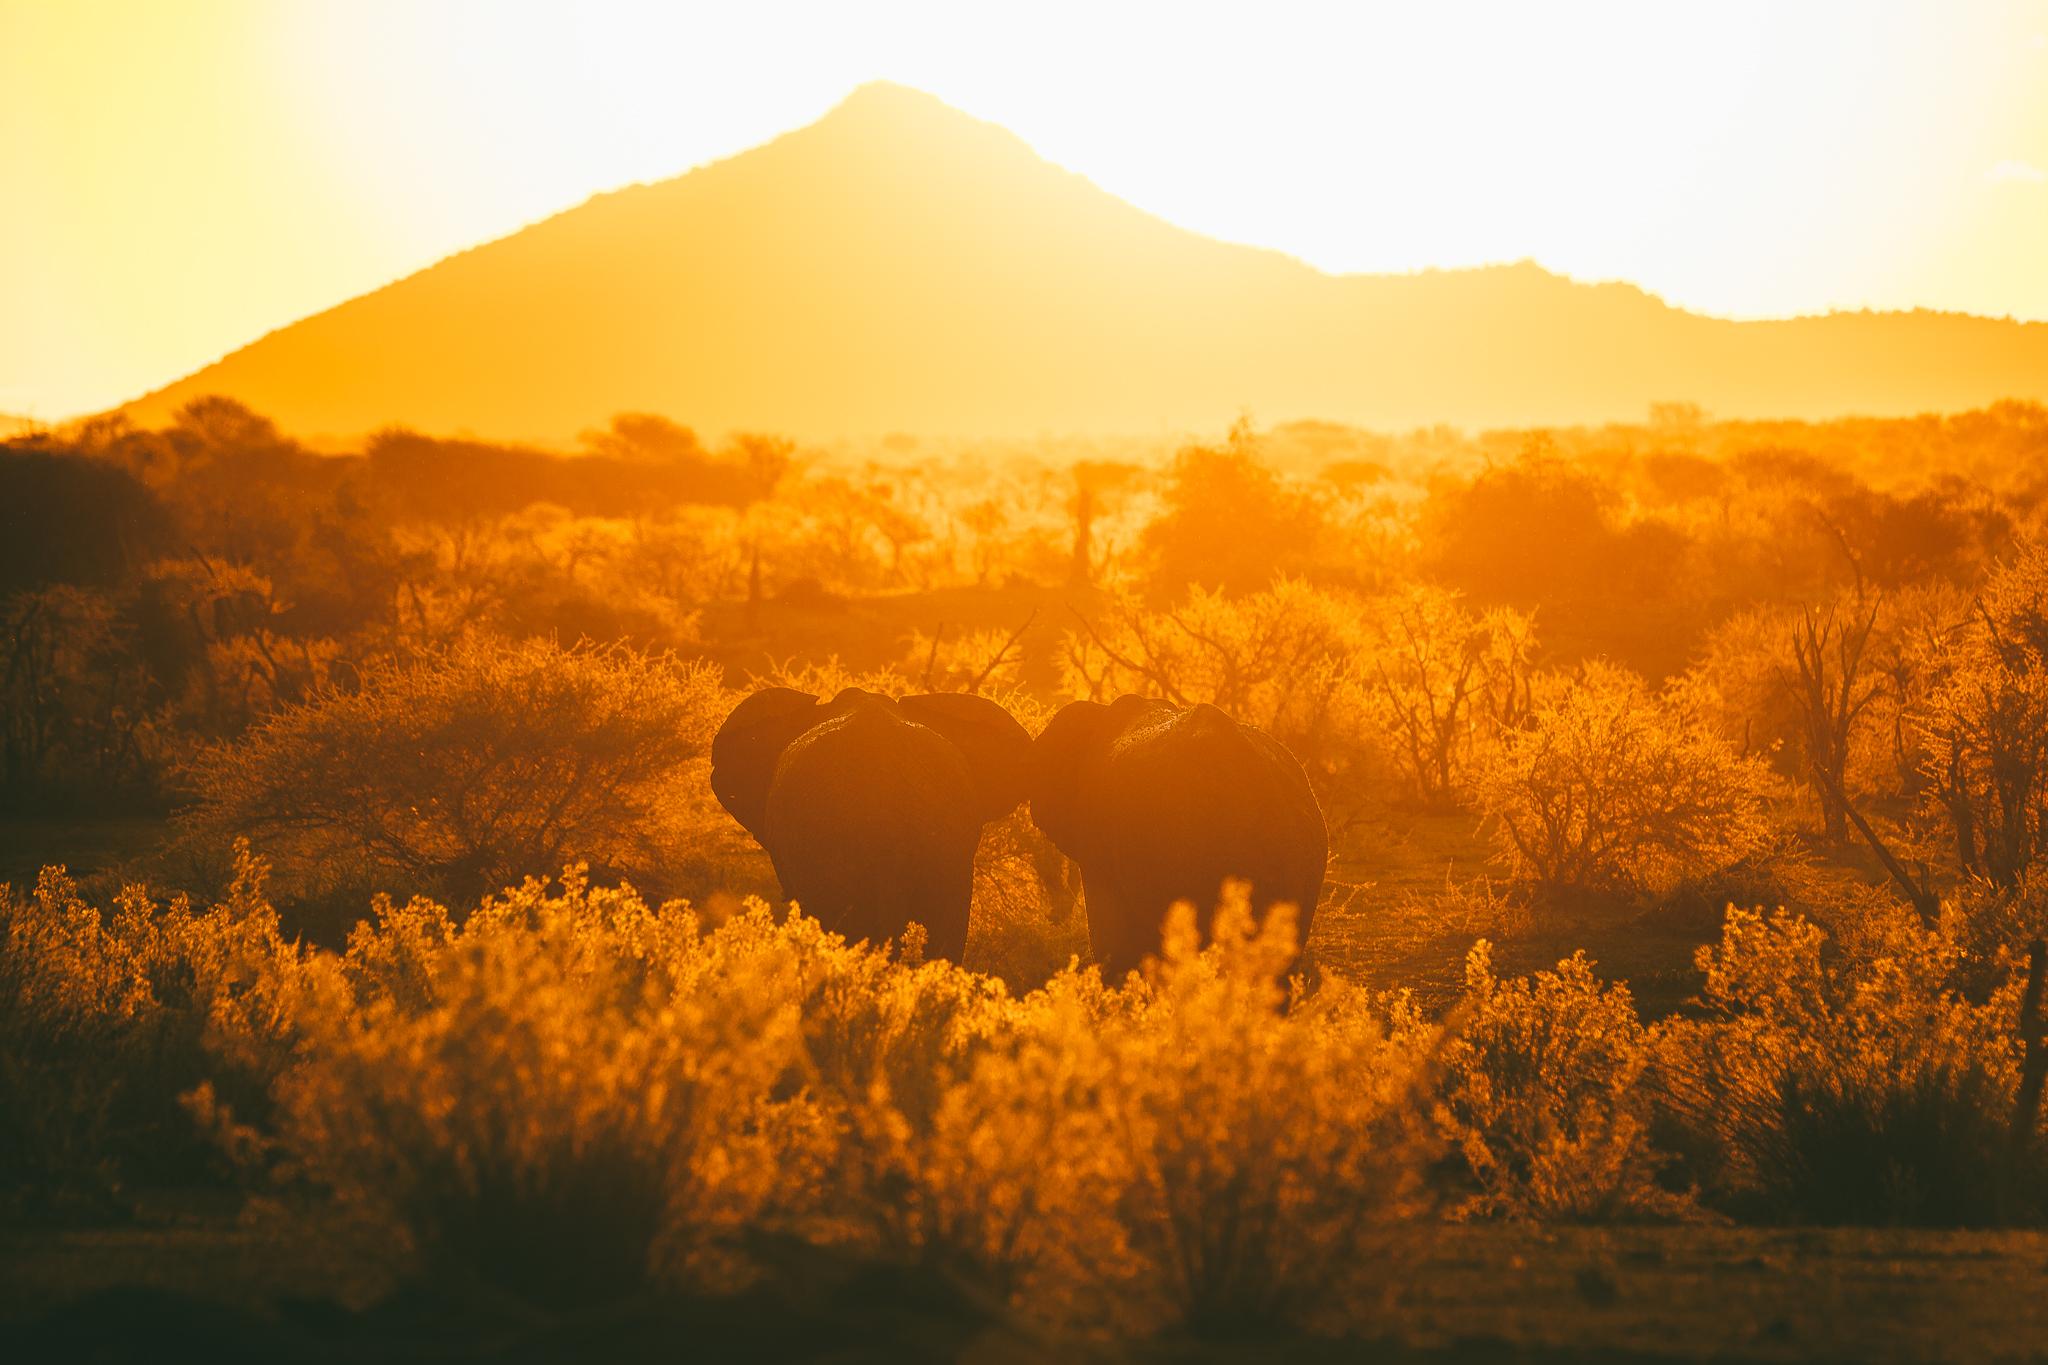 Melissa_Findley-SouthAfrica-Blog-06.jpg